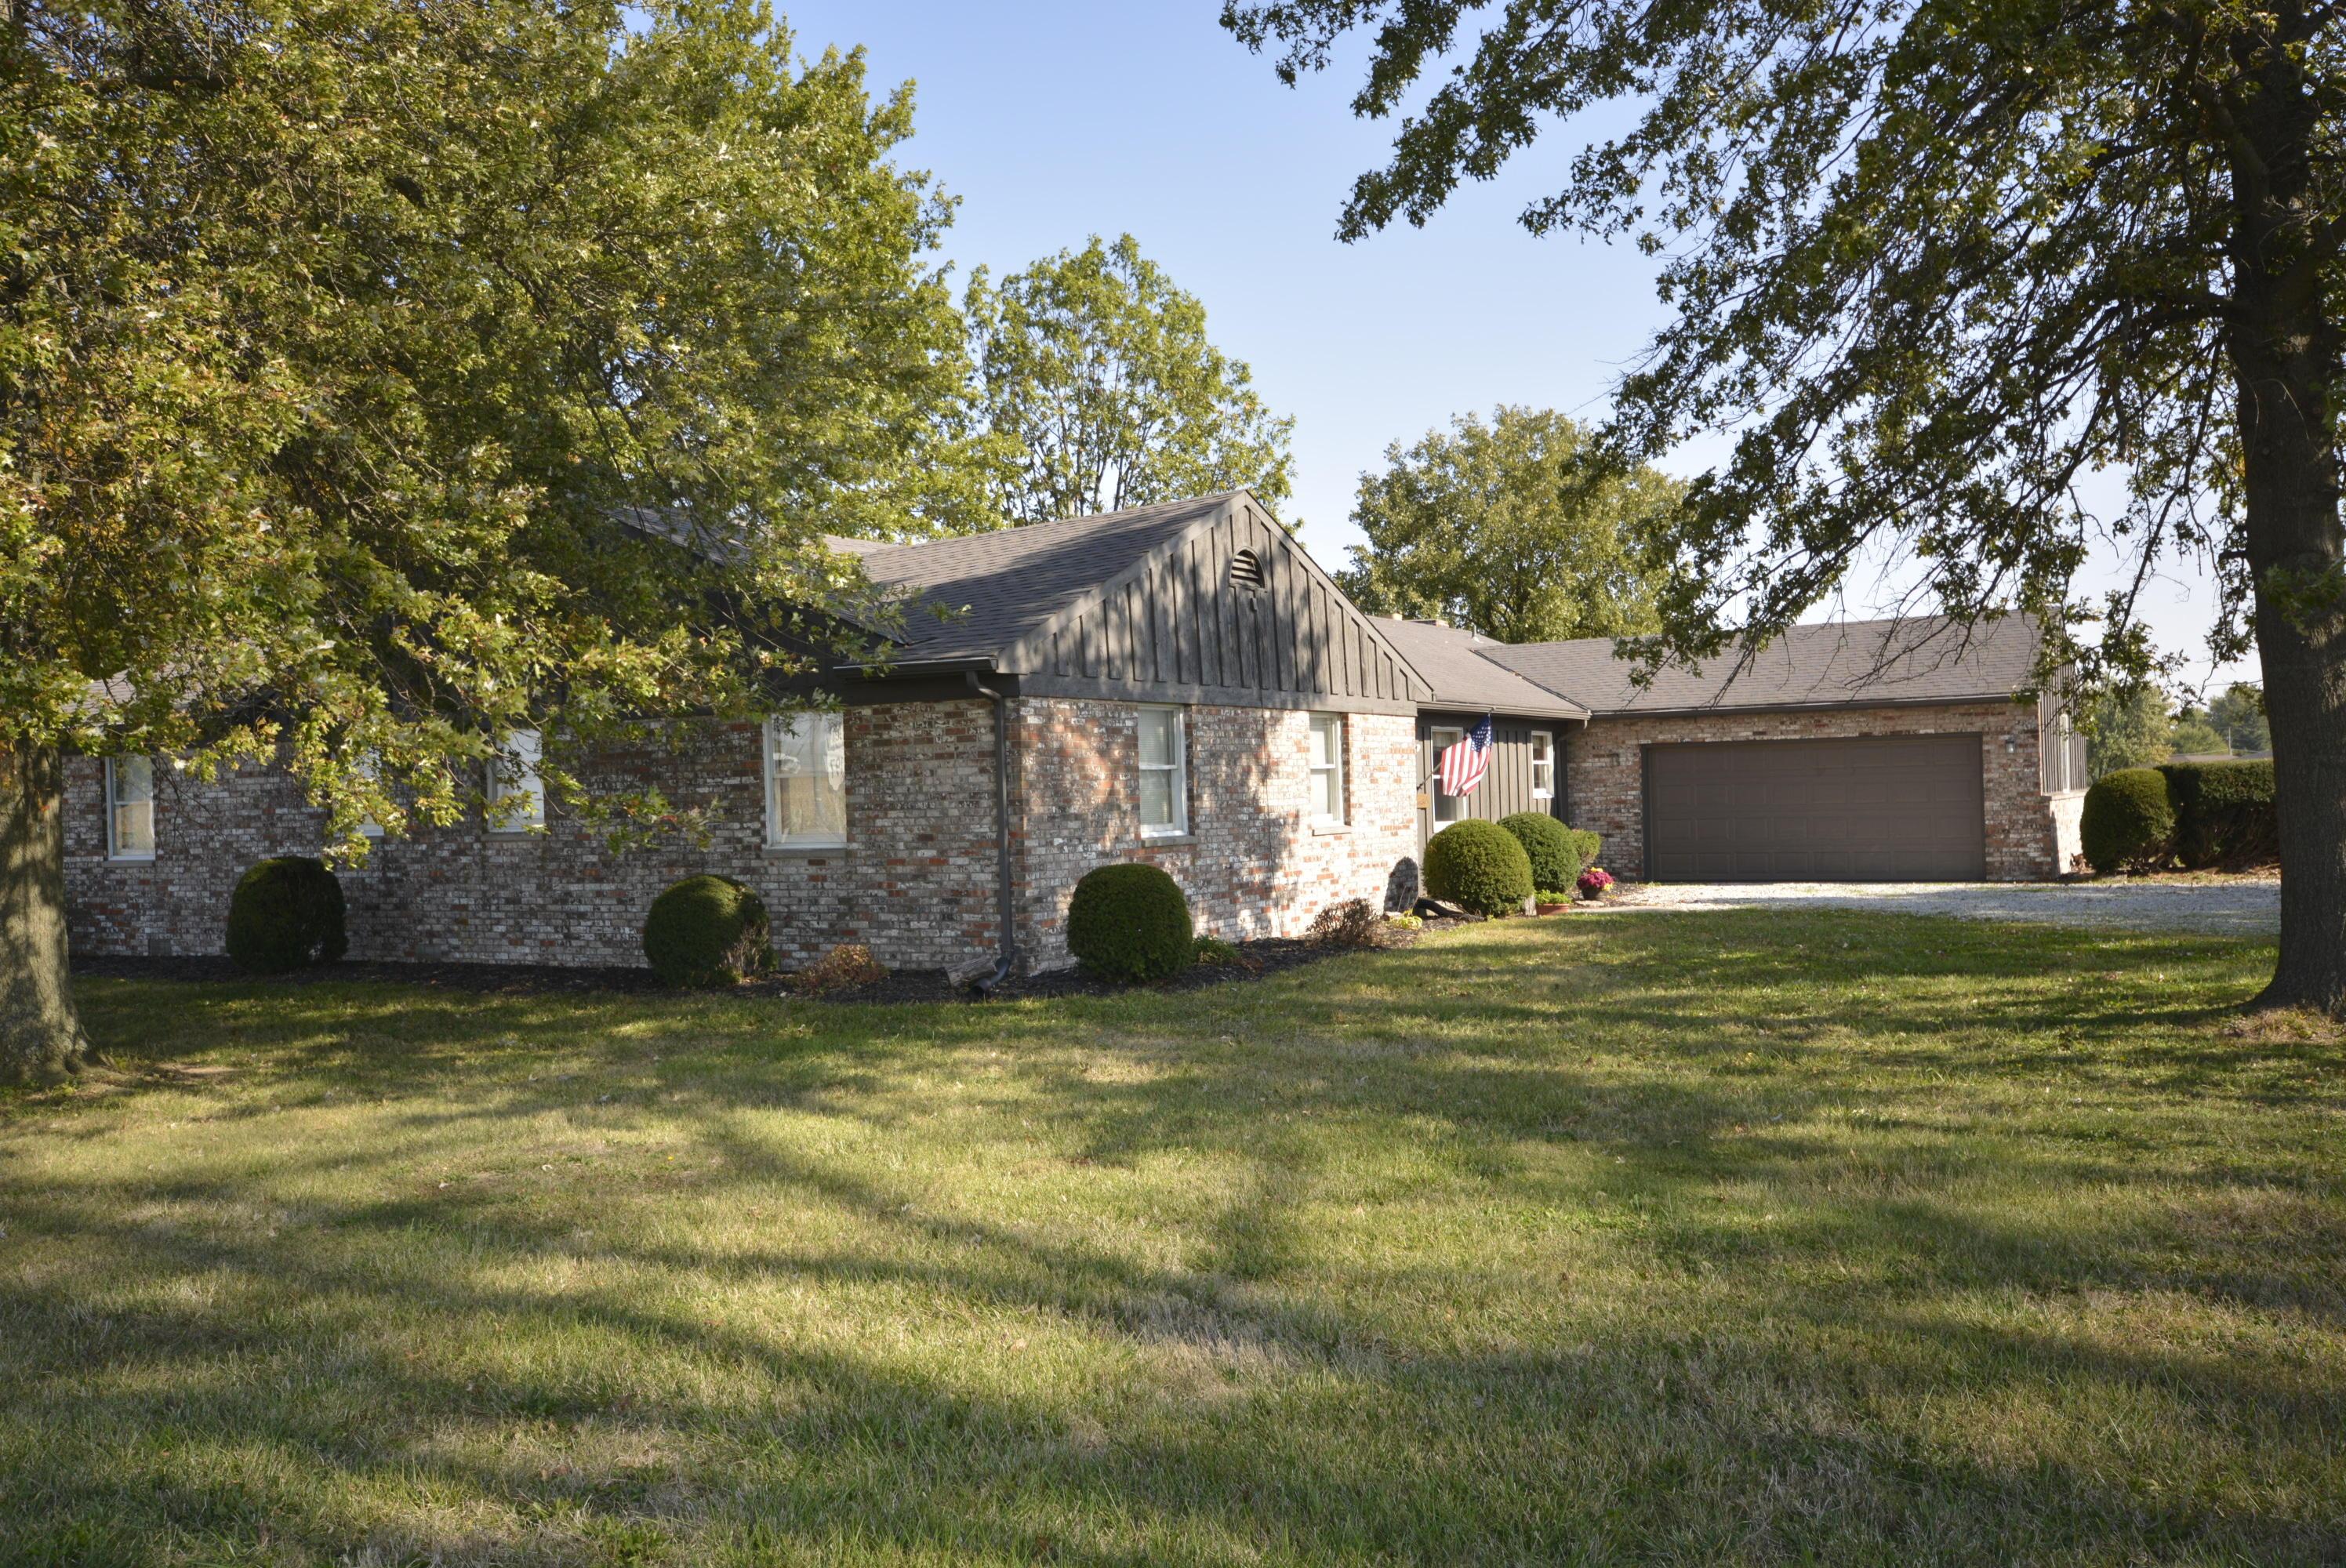 17888 St. Rt 198 Property Photo - Wapakoneta, OH real estate listing